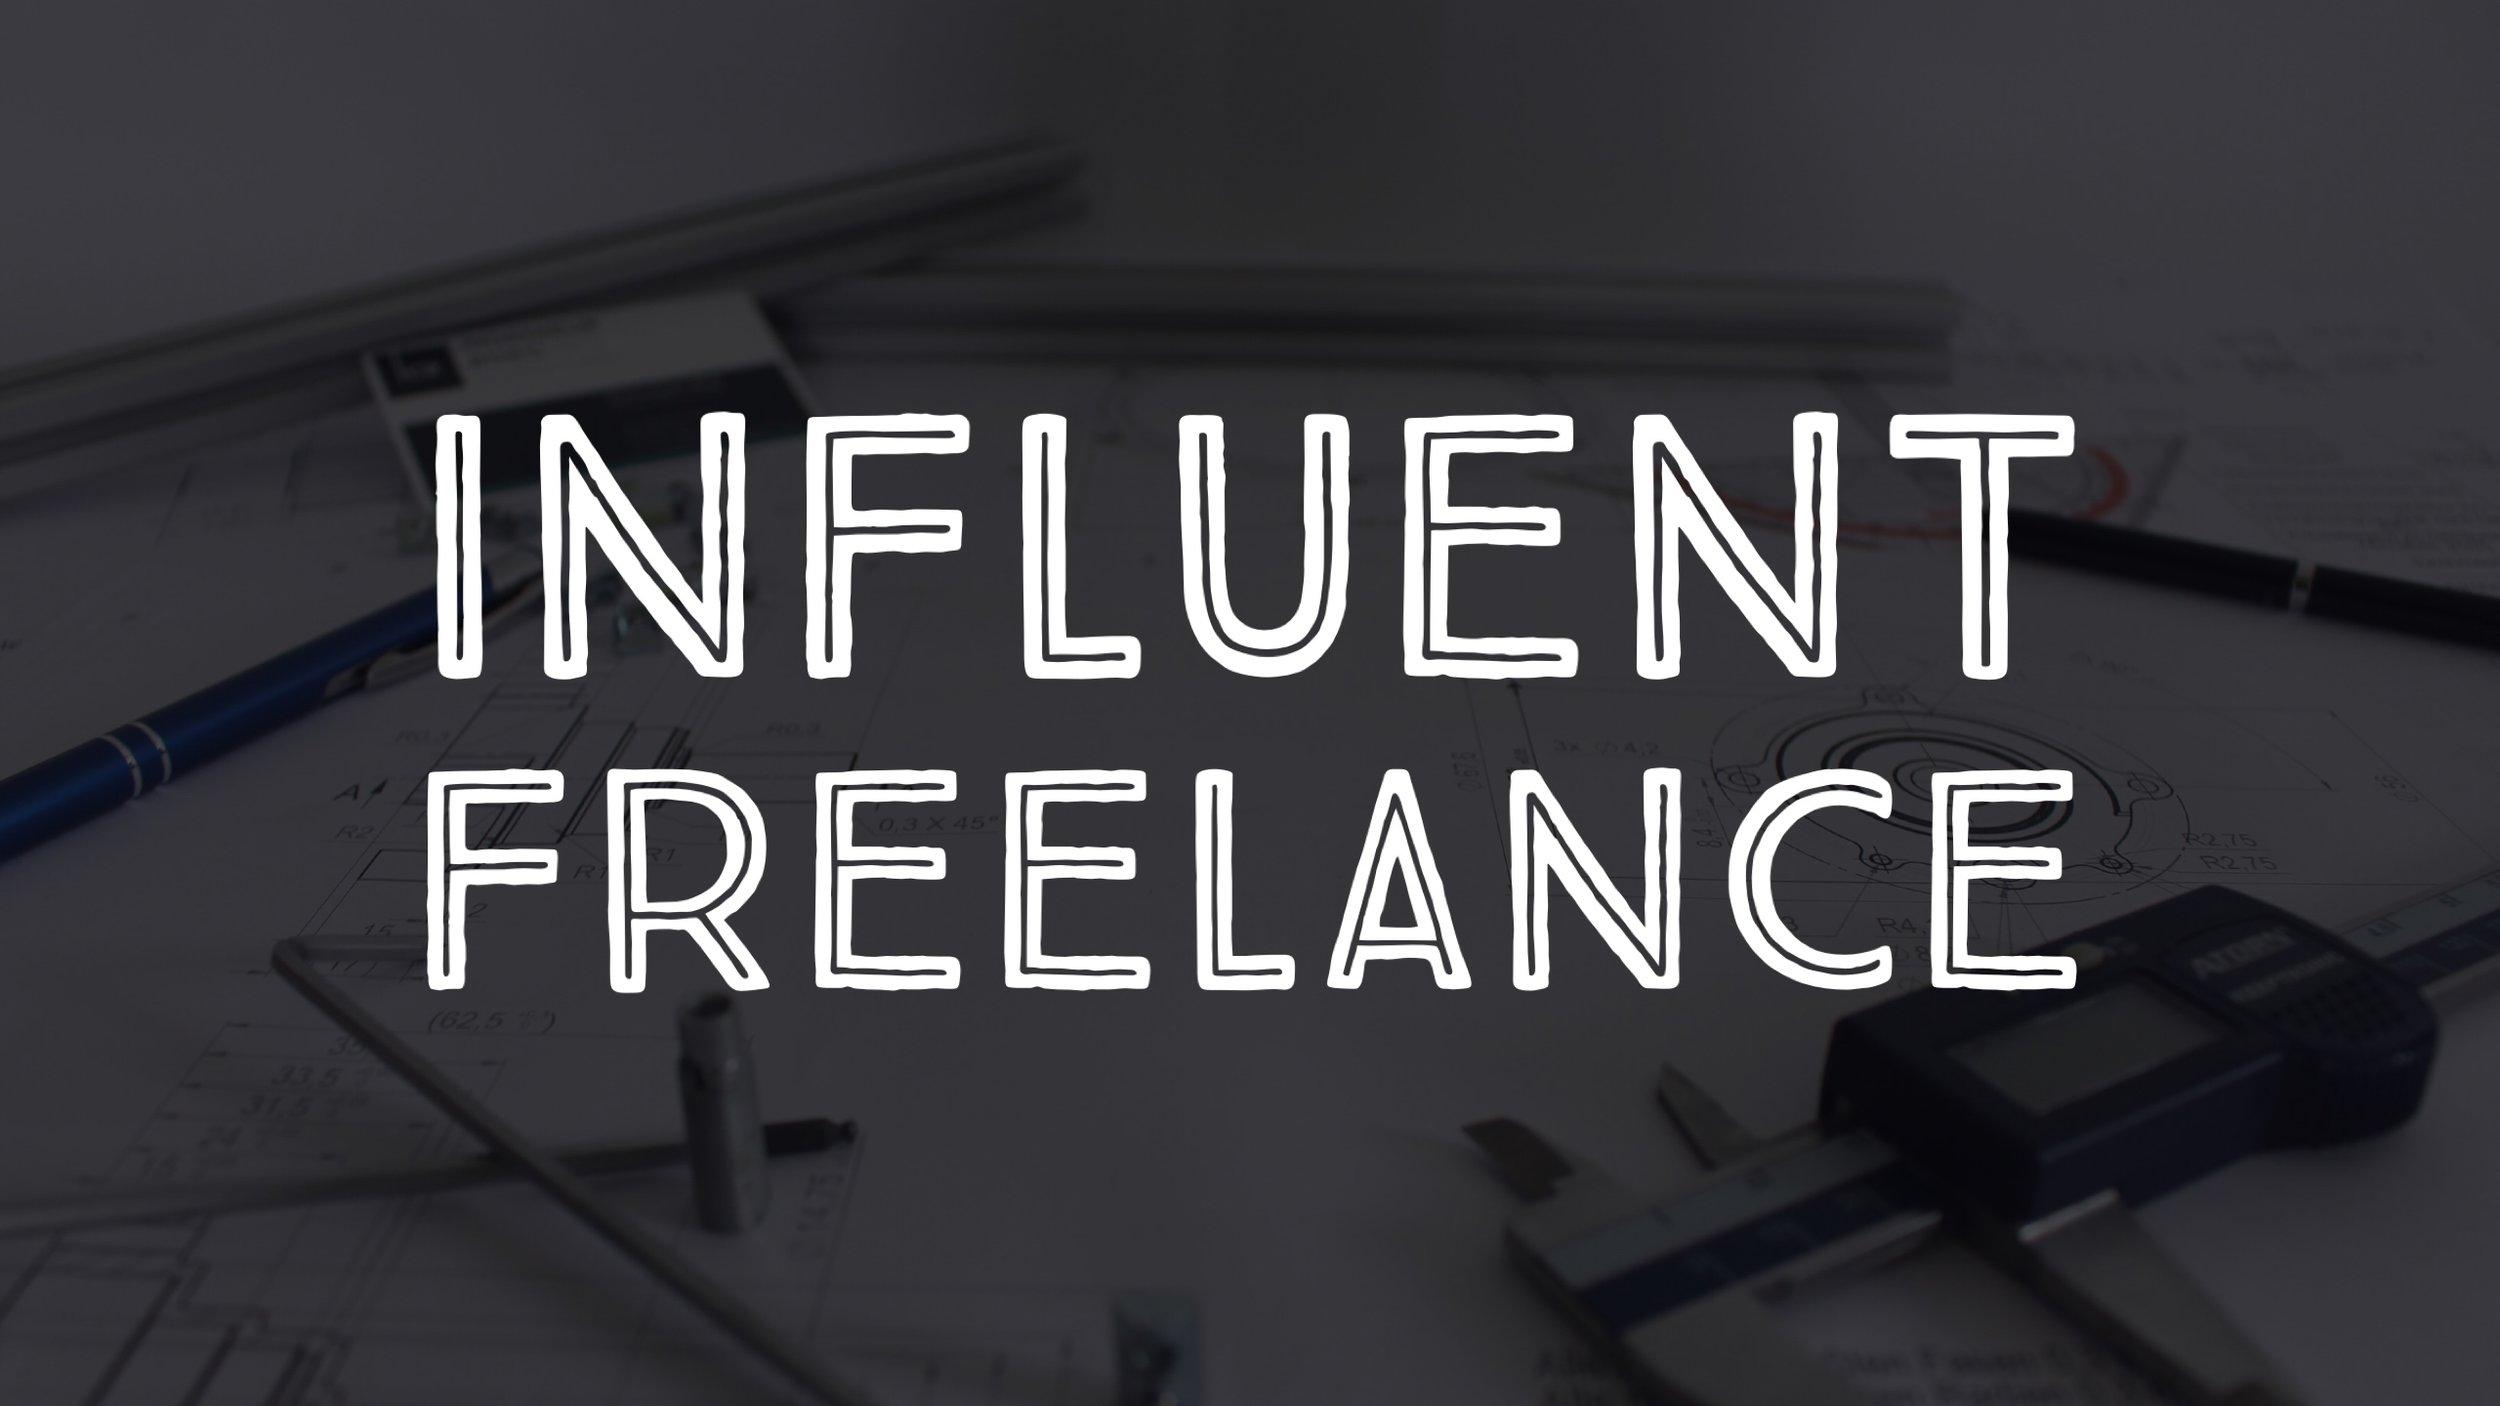 InFluent Media Freelance 5.JPG